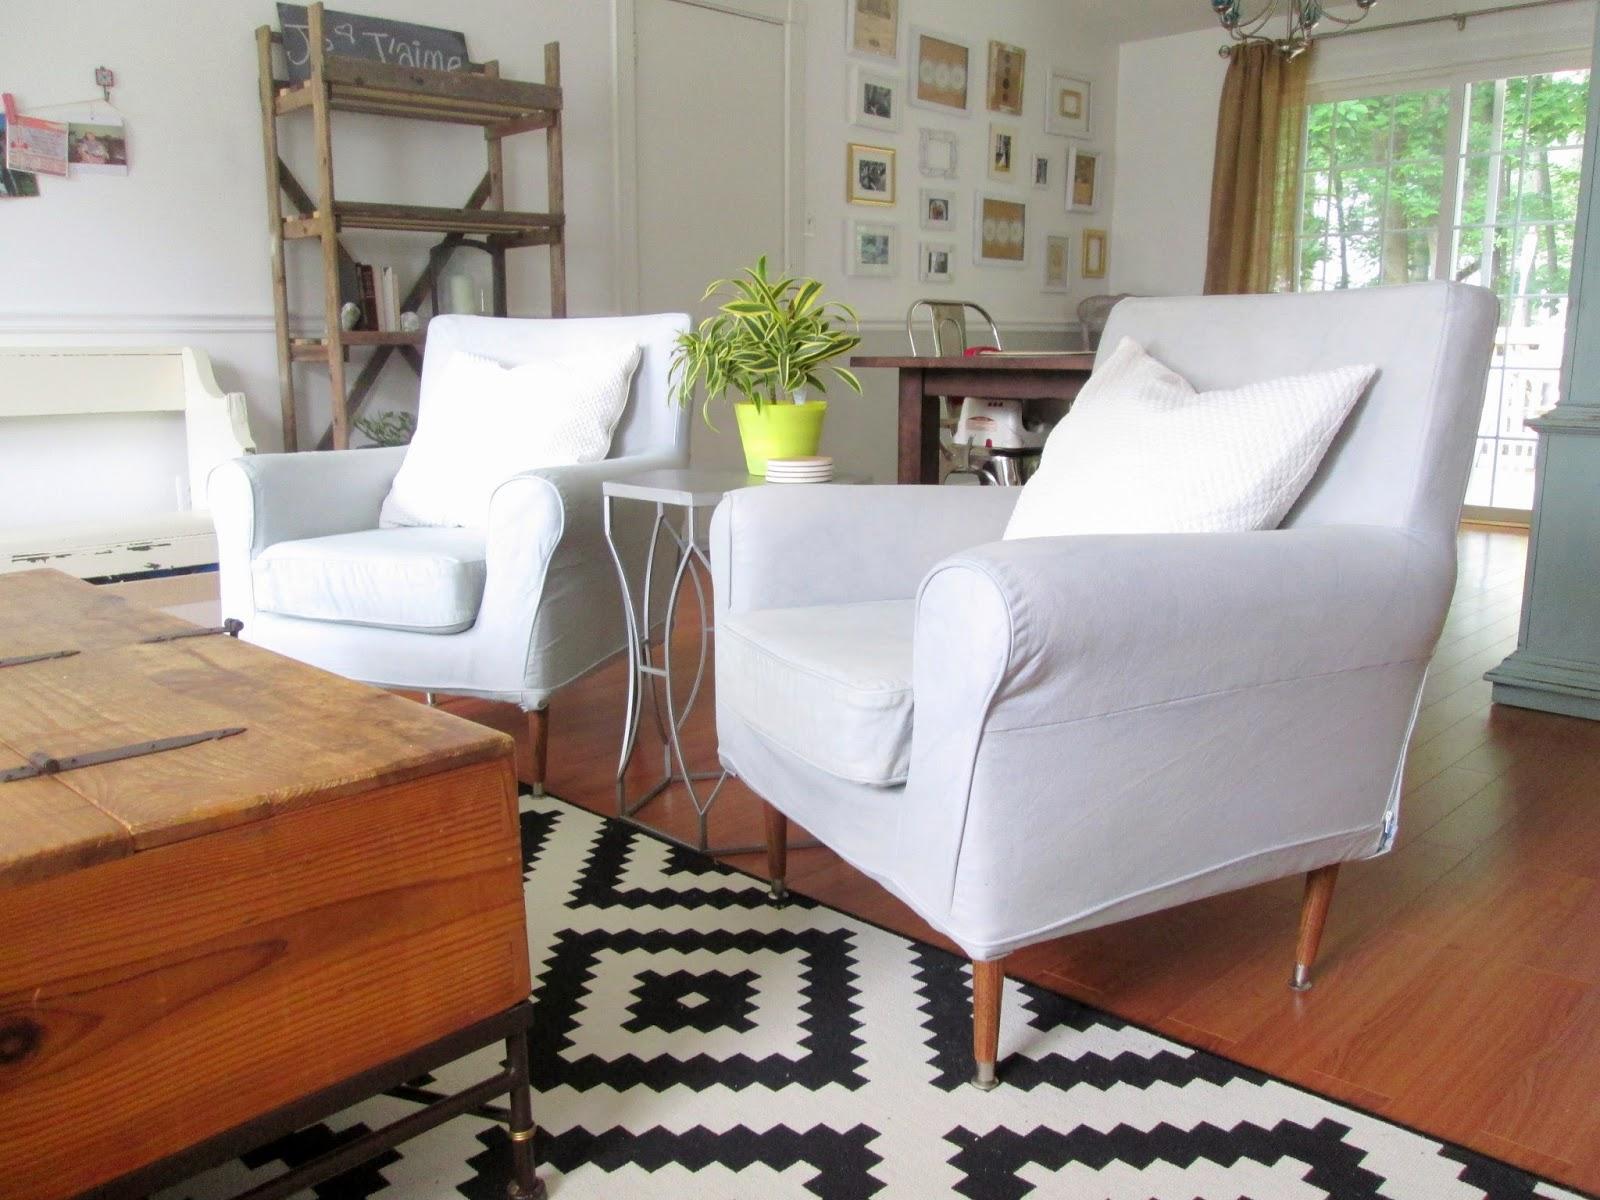 chelsea 39 s garage diy mid century modern chairs full. Black Bedroom Furniture Sets. Home Design Ideas